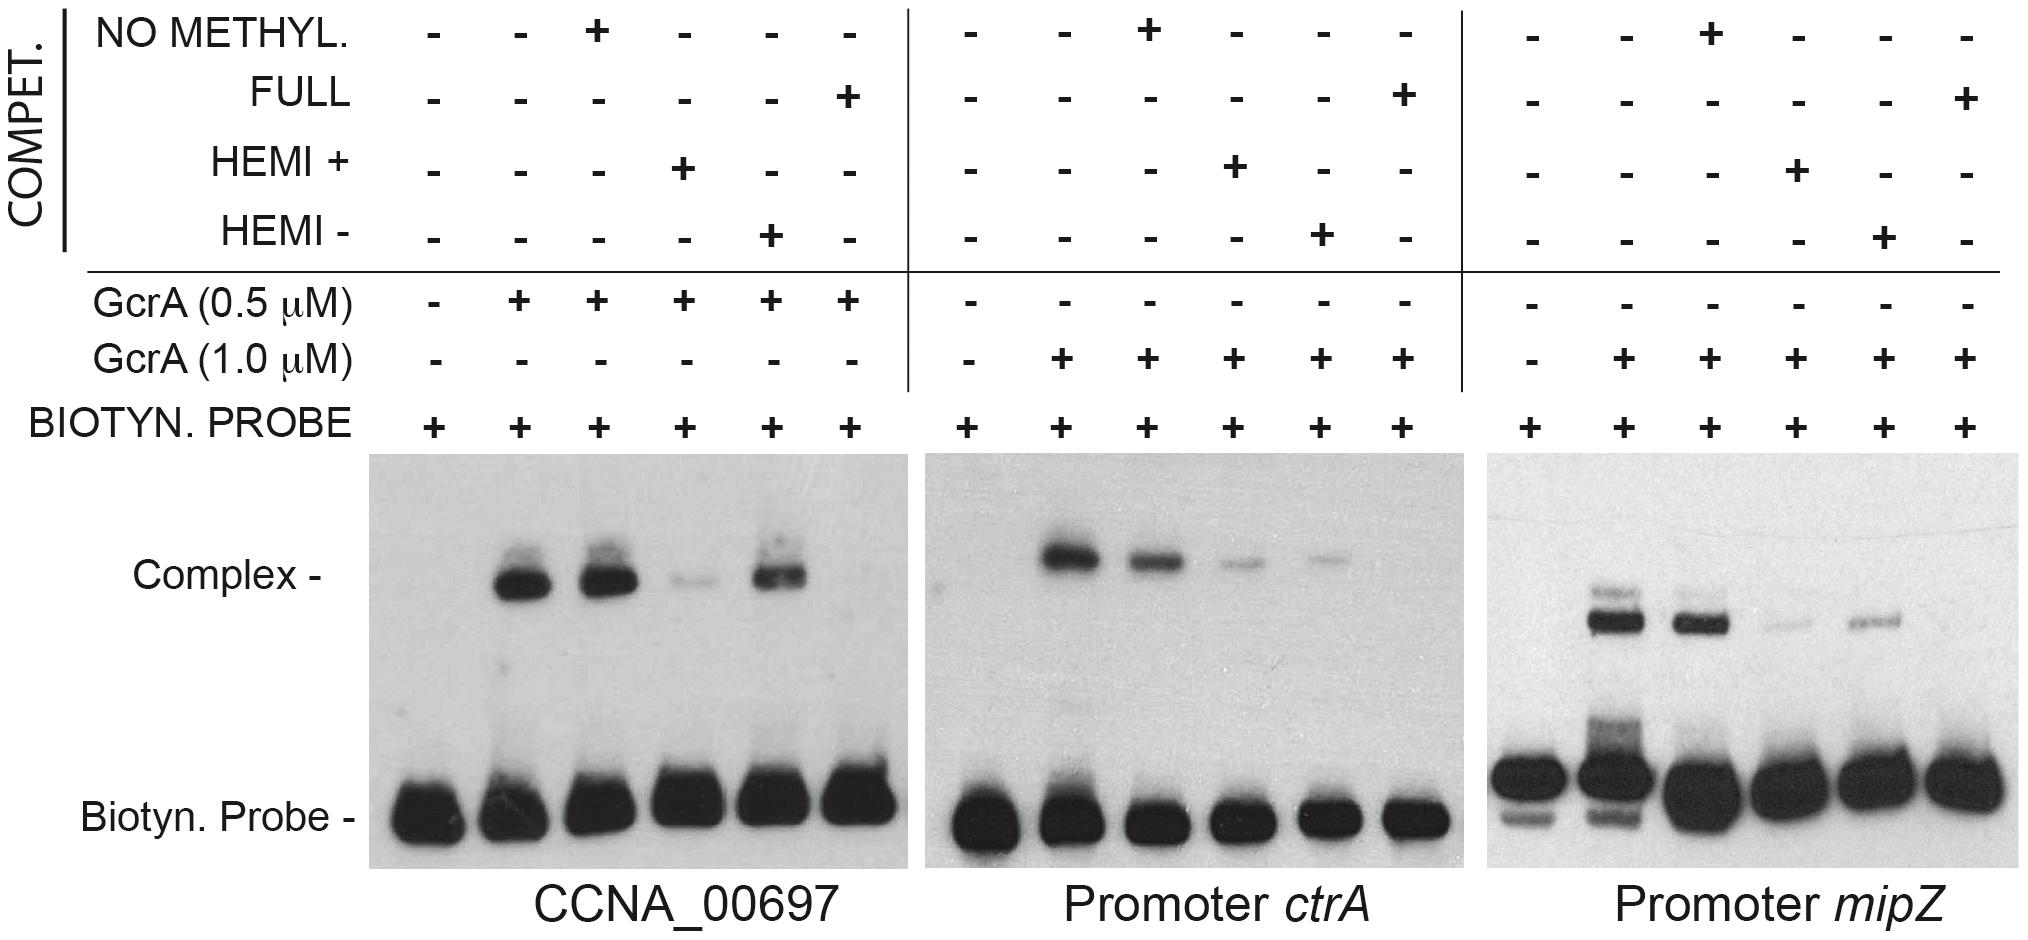 GcrA DNA binding depends on CcrM methylation state.